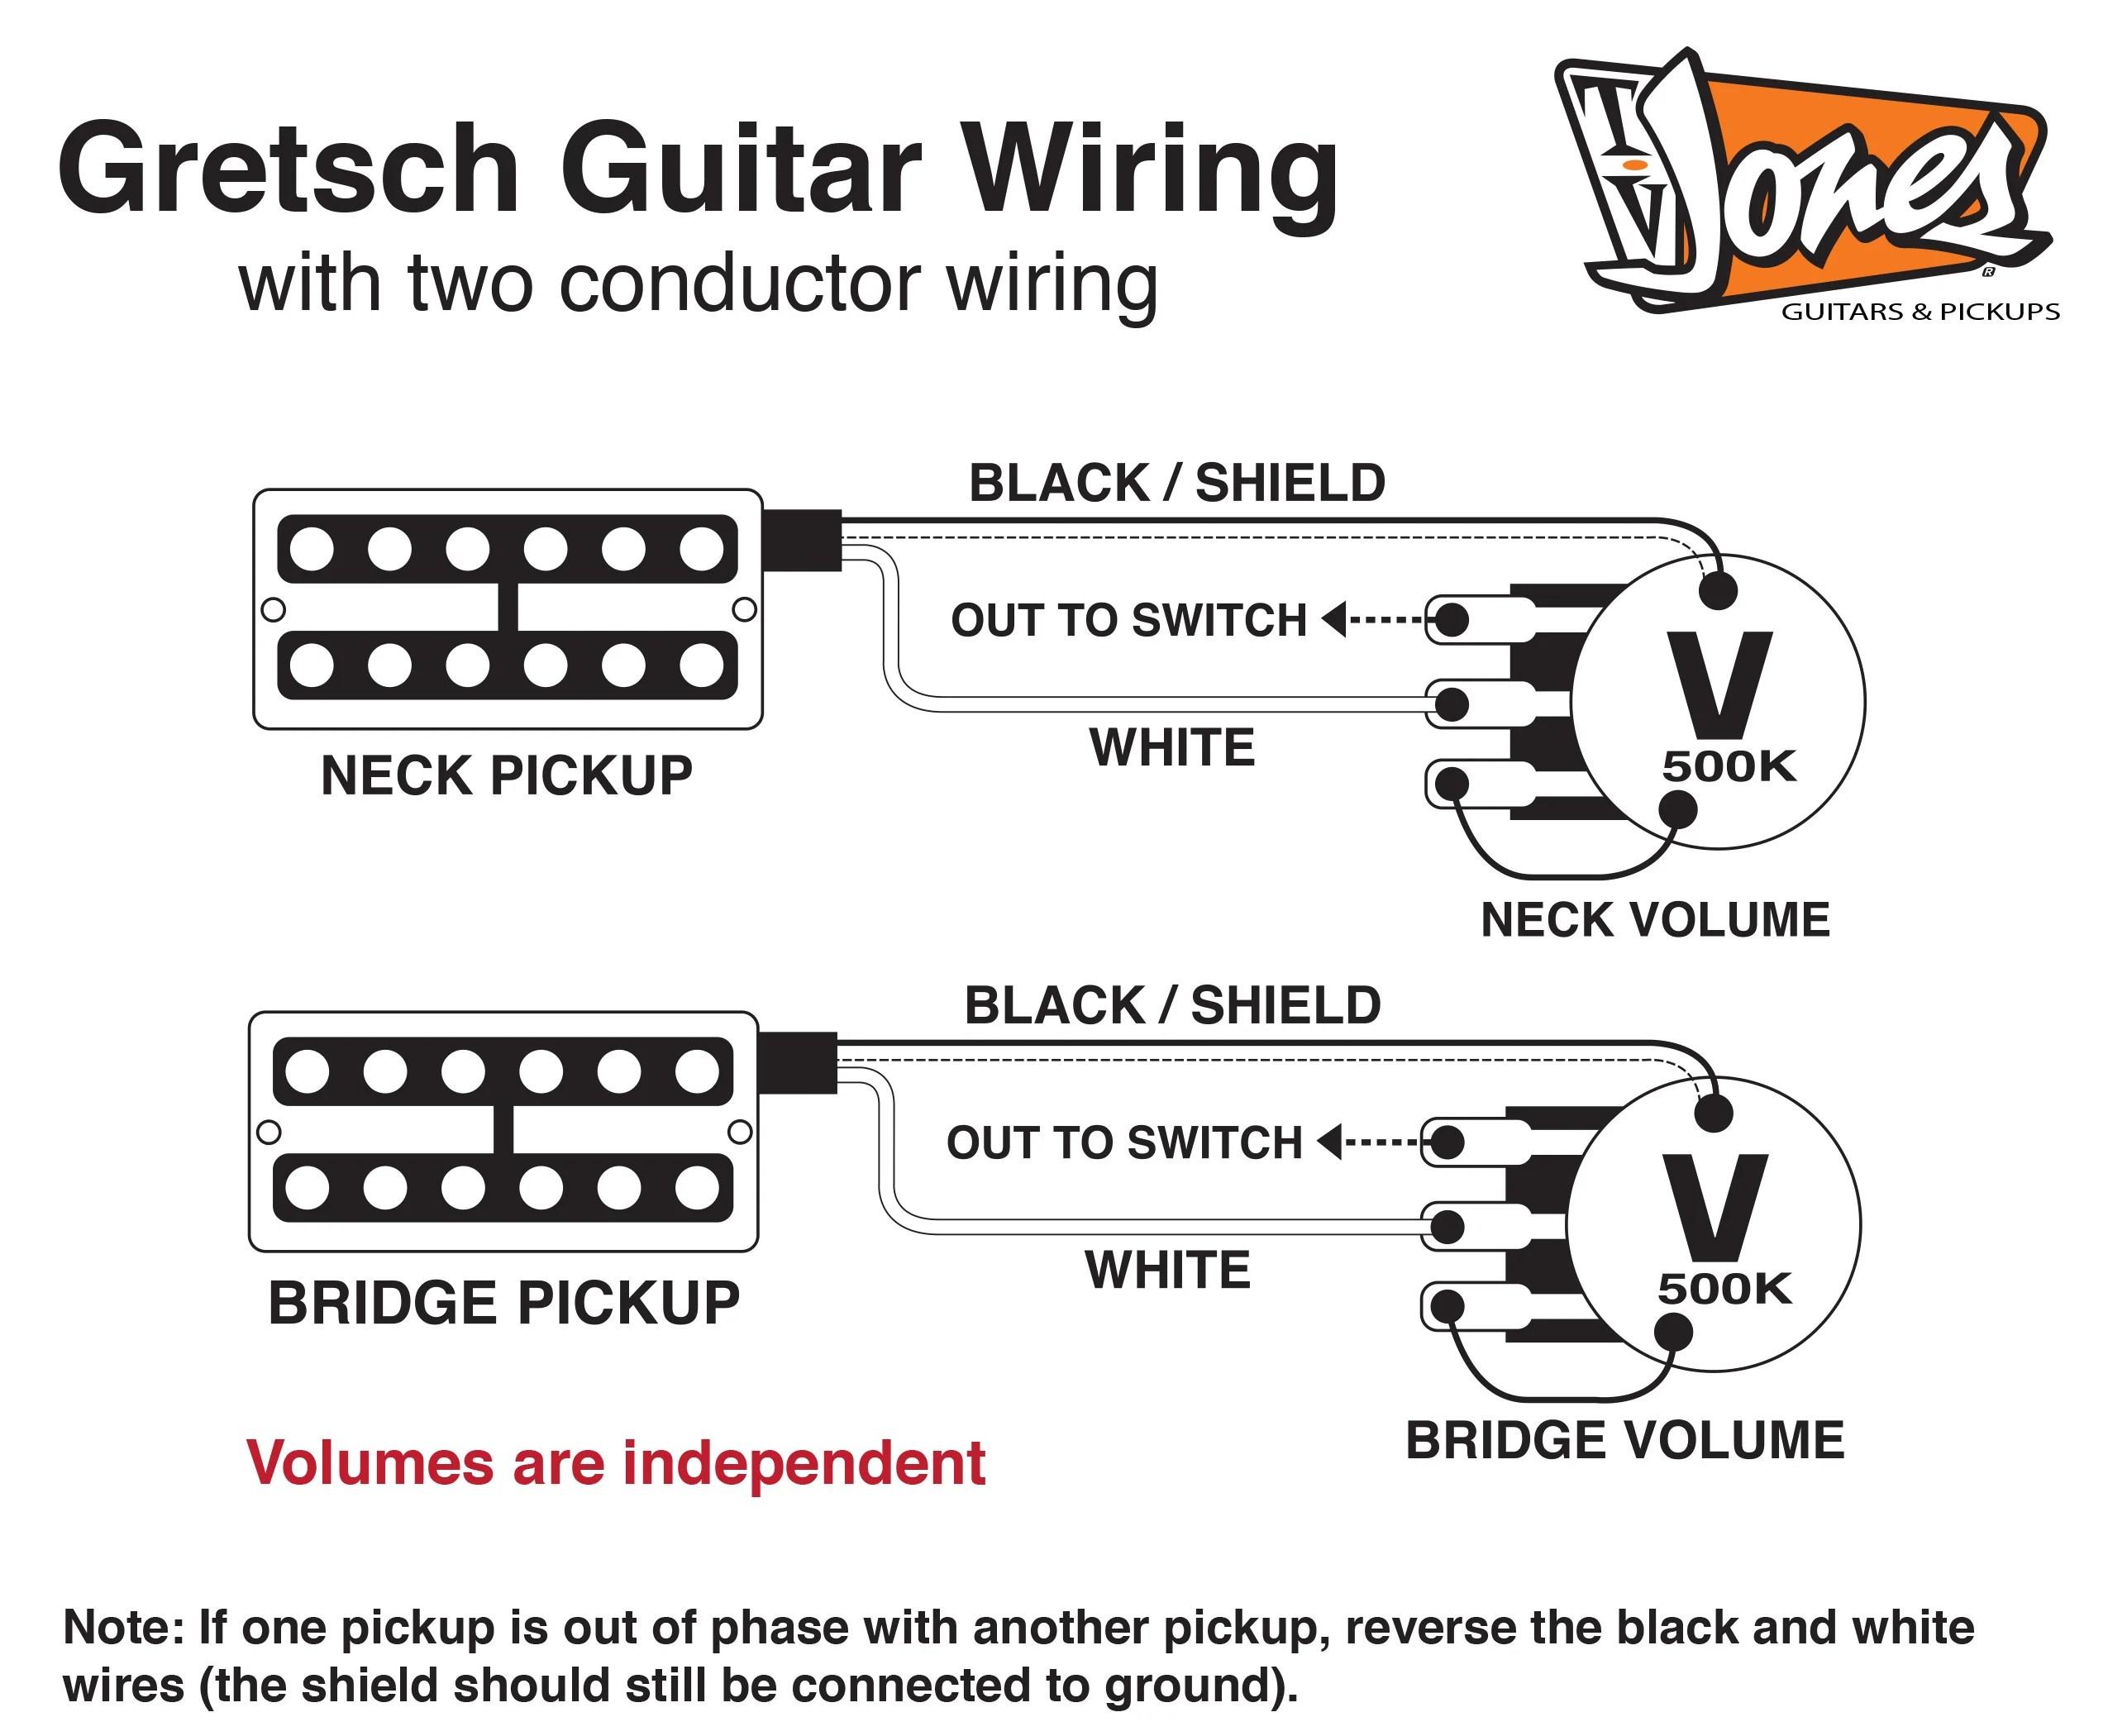 hight resolution of gretsch wiring diagrams schematic diagramsgretsch guitar wiring diagrams electrical wiring diagrams gretsch guitar wiring diagrams gretsch